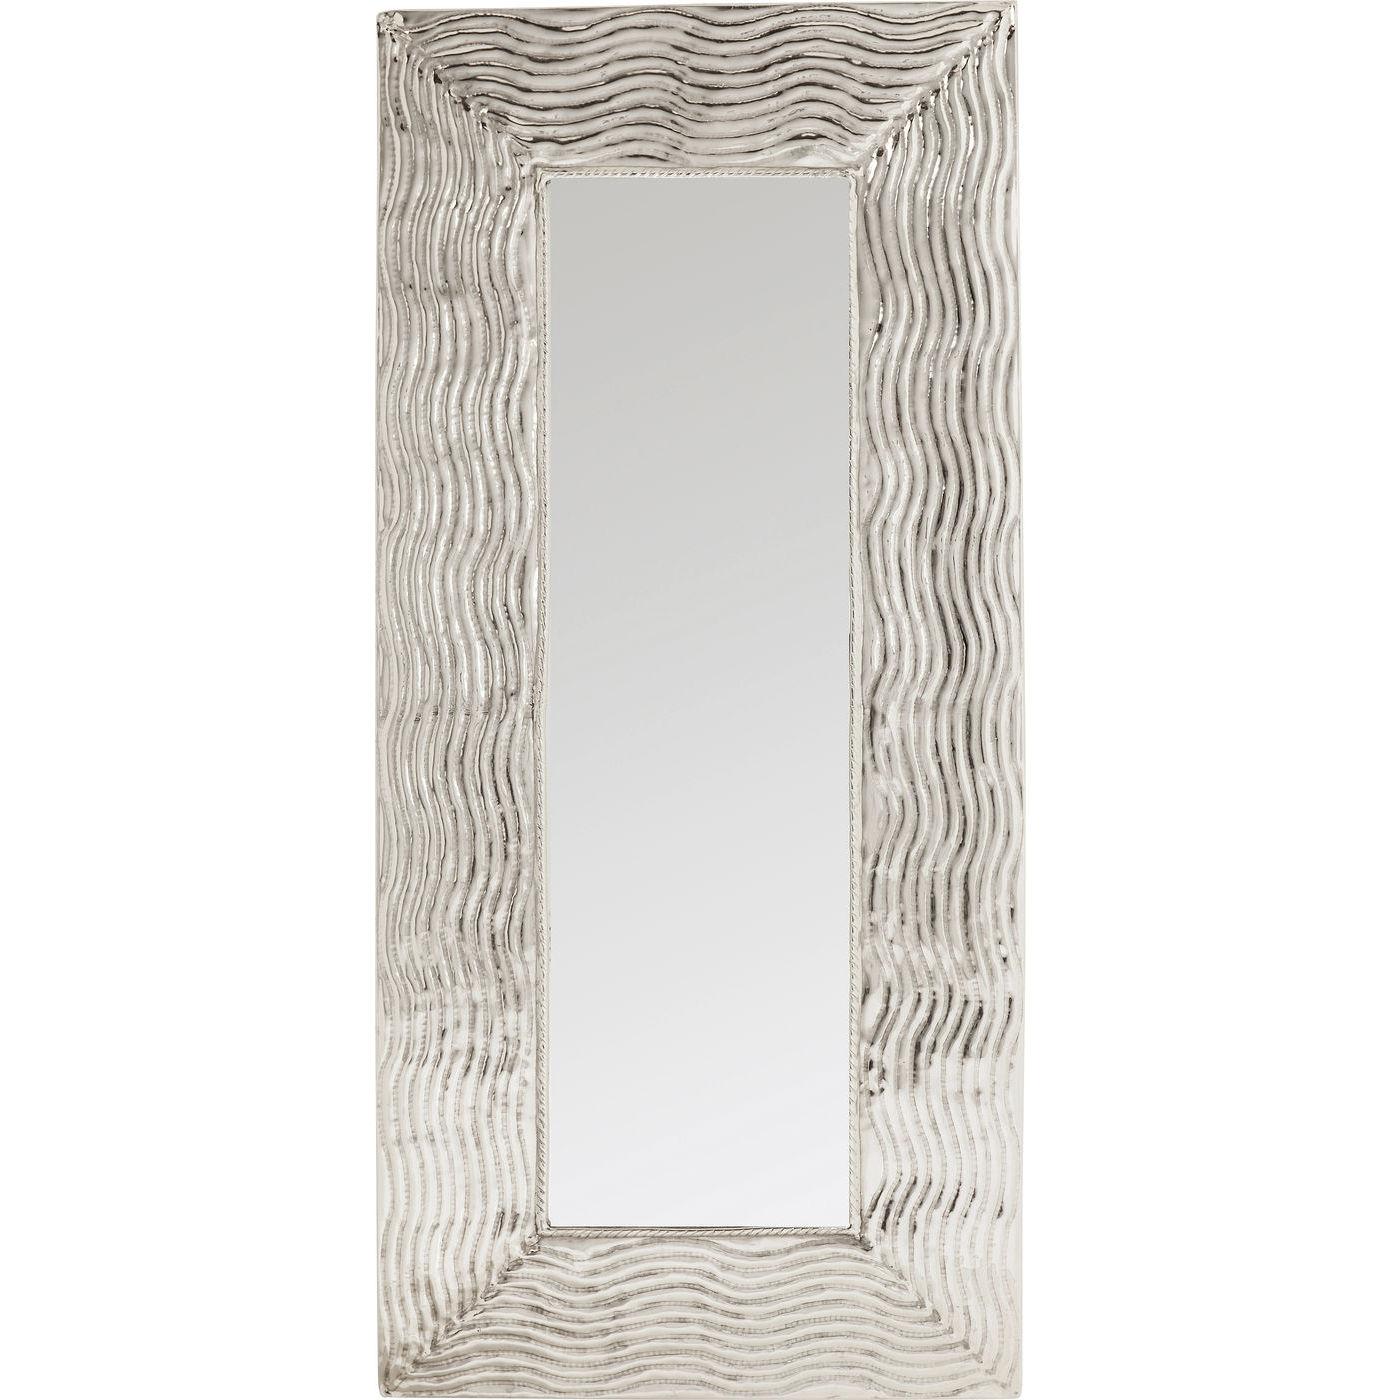 kare design – Kare design pluto xxl vægspejl - spejlglas/sølv aluminium, håndlavet (200x90) på boboonline.dk